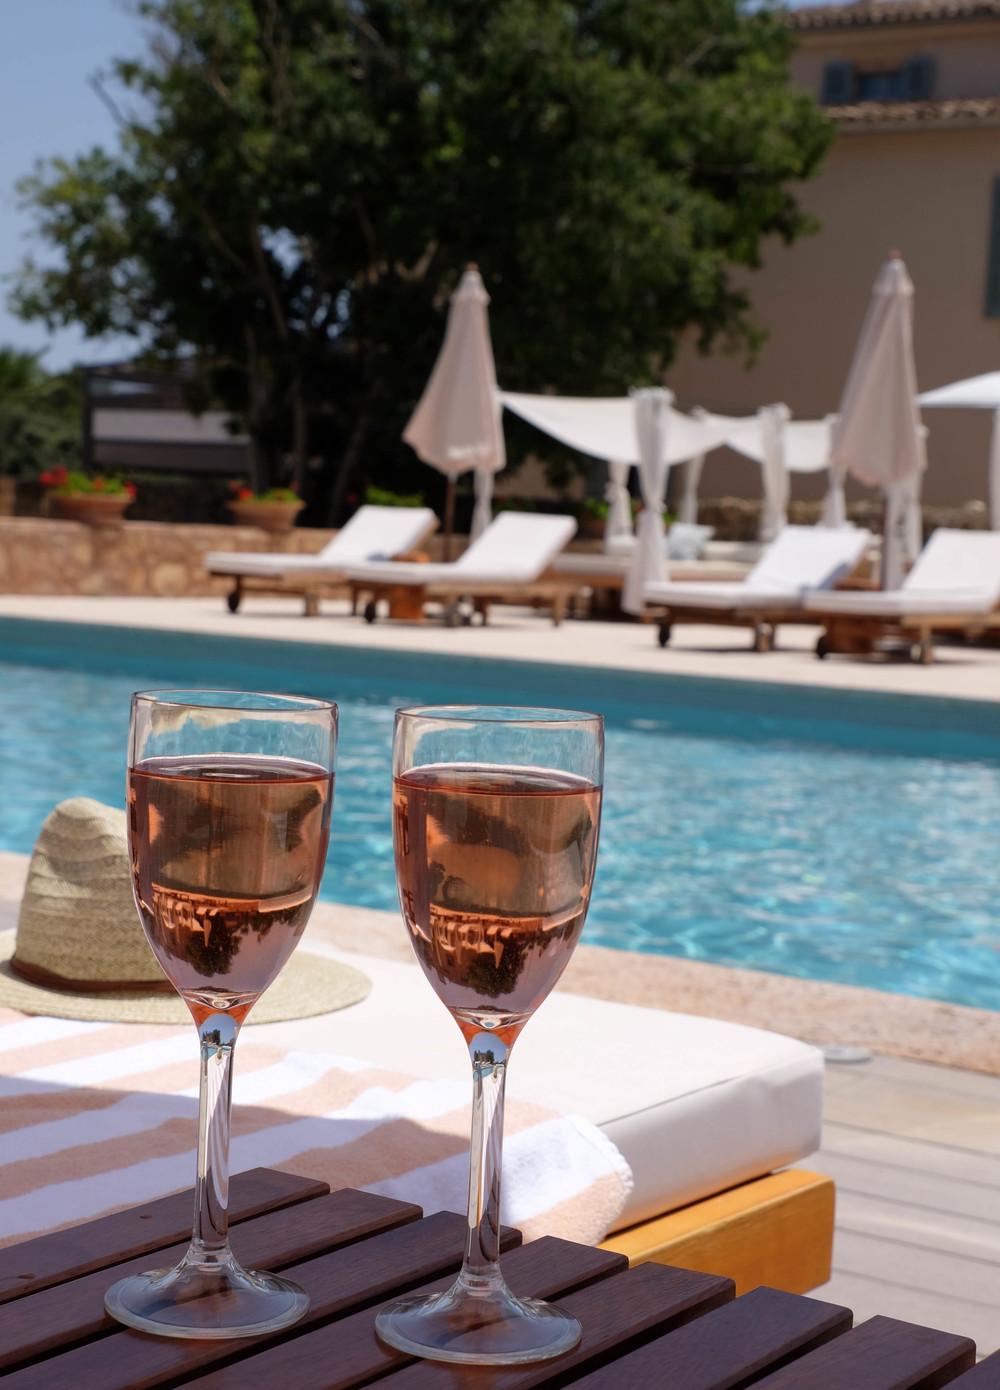 LaurenSchwaiger-Travel-Blog-Mallorca-Spain-Rose-Pool-Hotel-Predi-Son-Jaumell.jpg